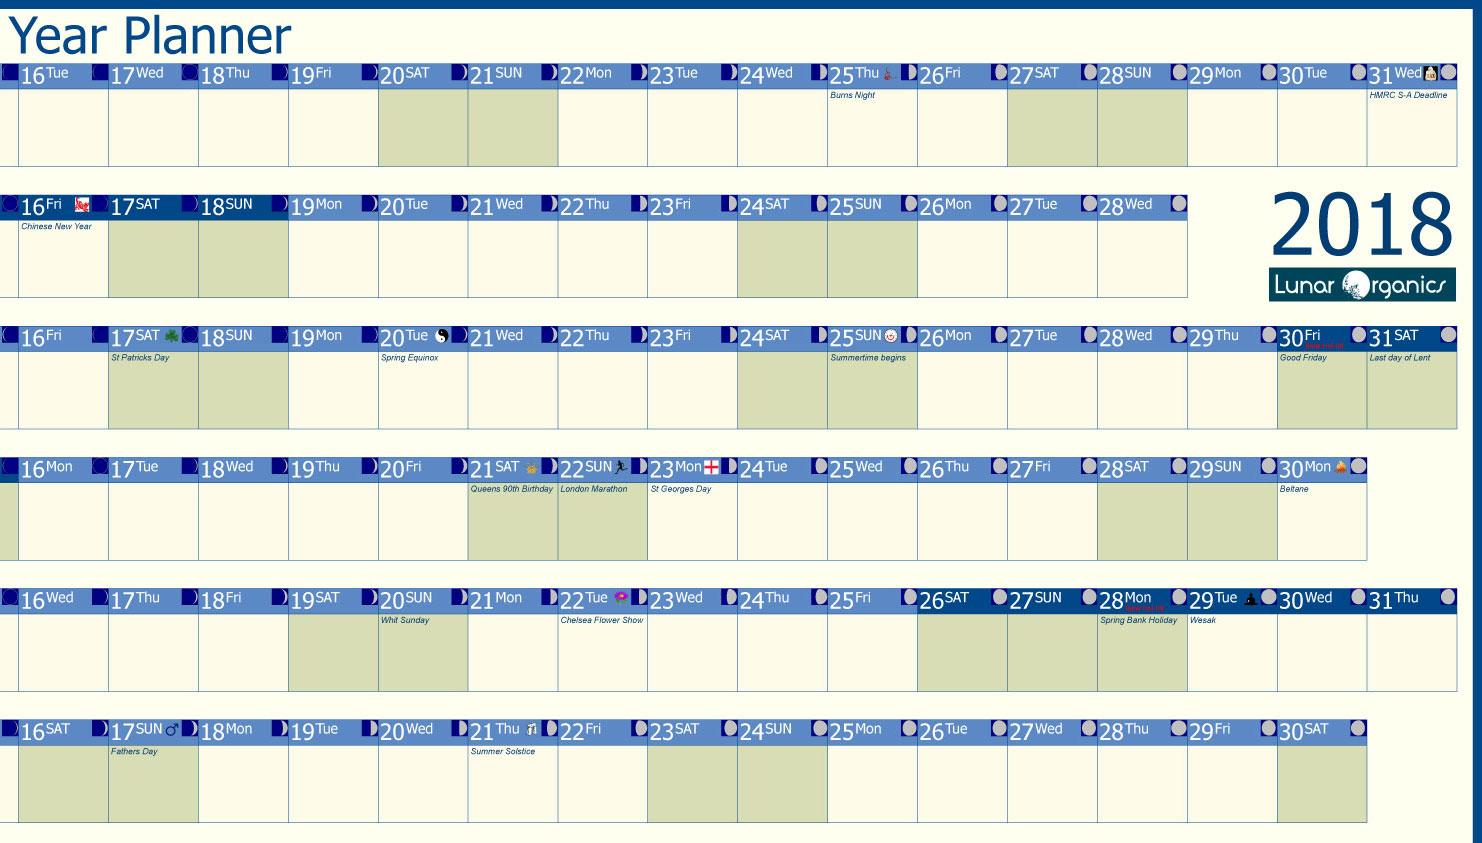 Year Planner Calendar : Professional year planner lunarorganics